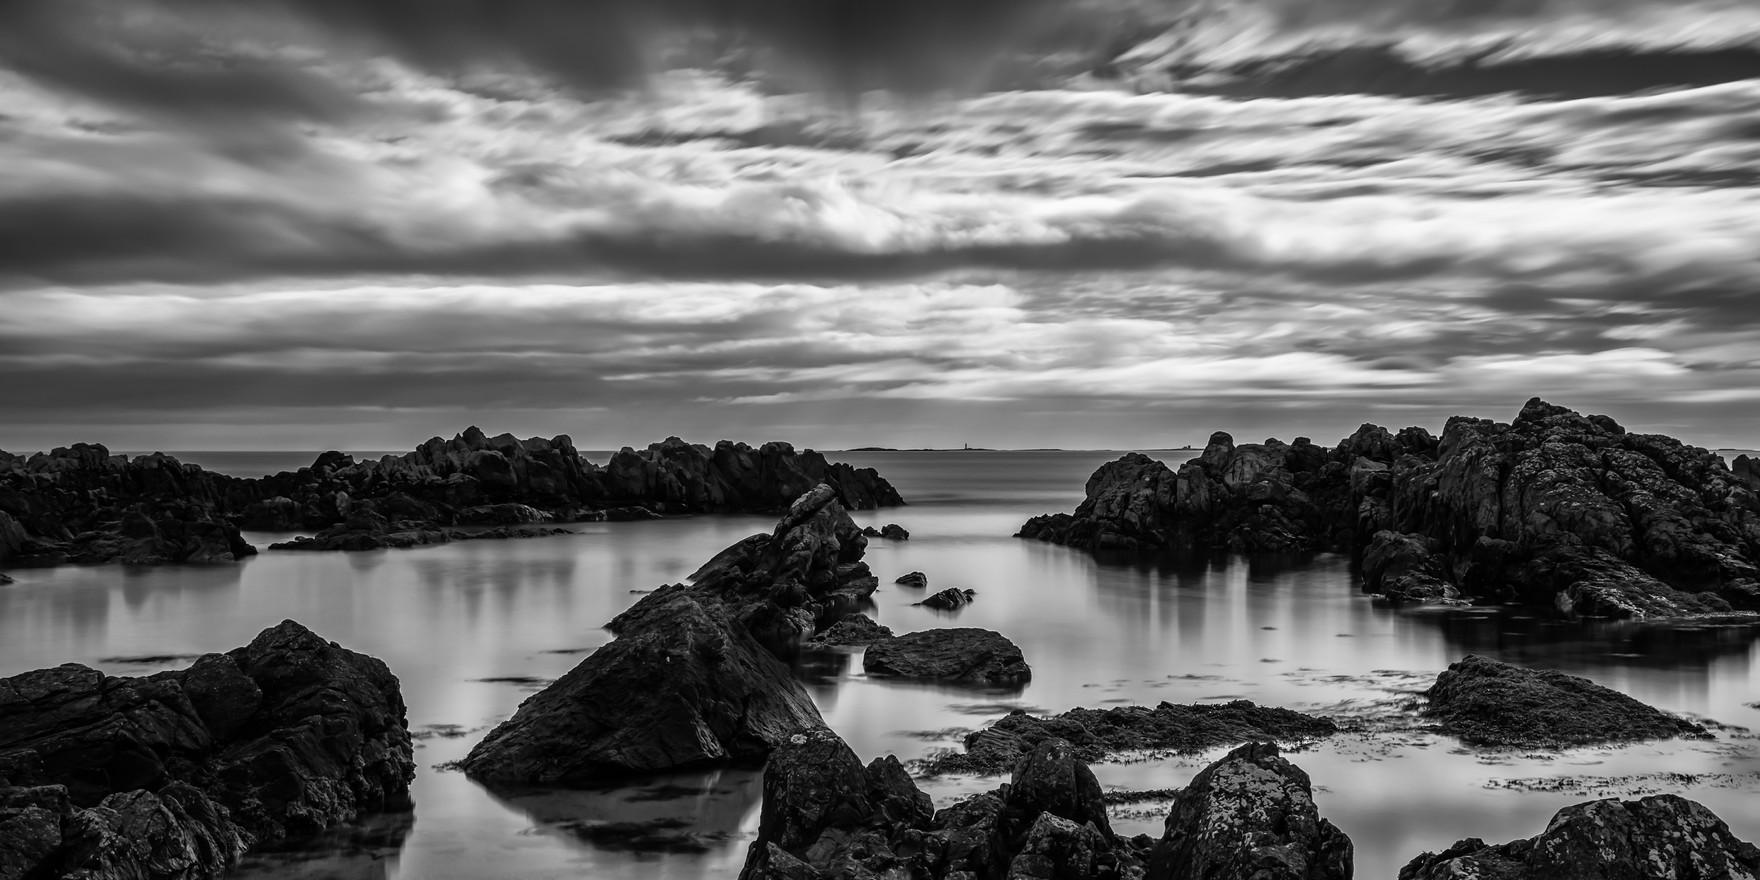 Harkess Rocks, Bamburgh